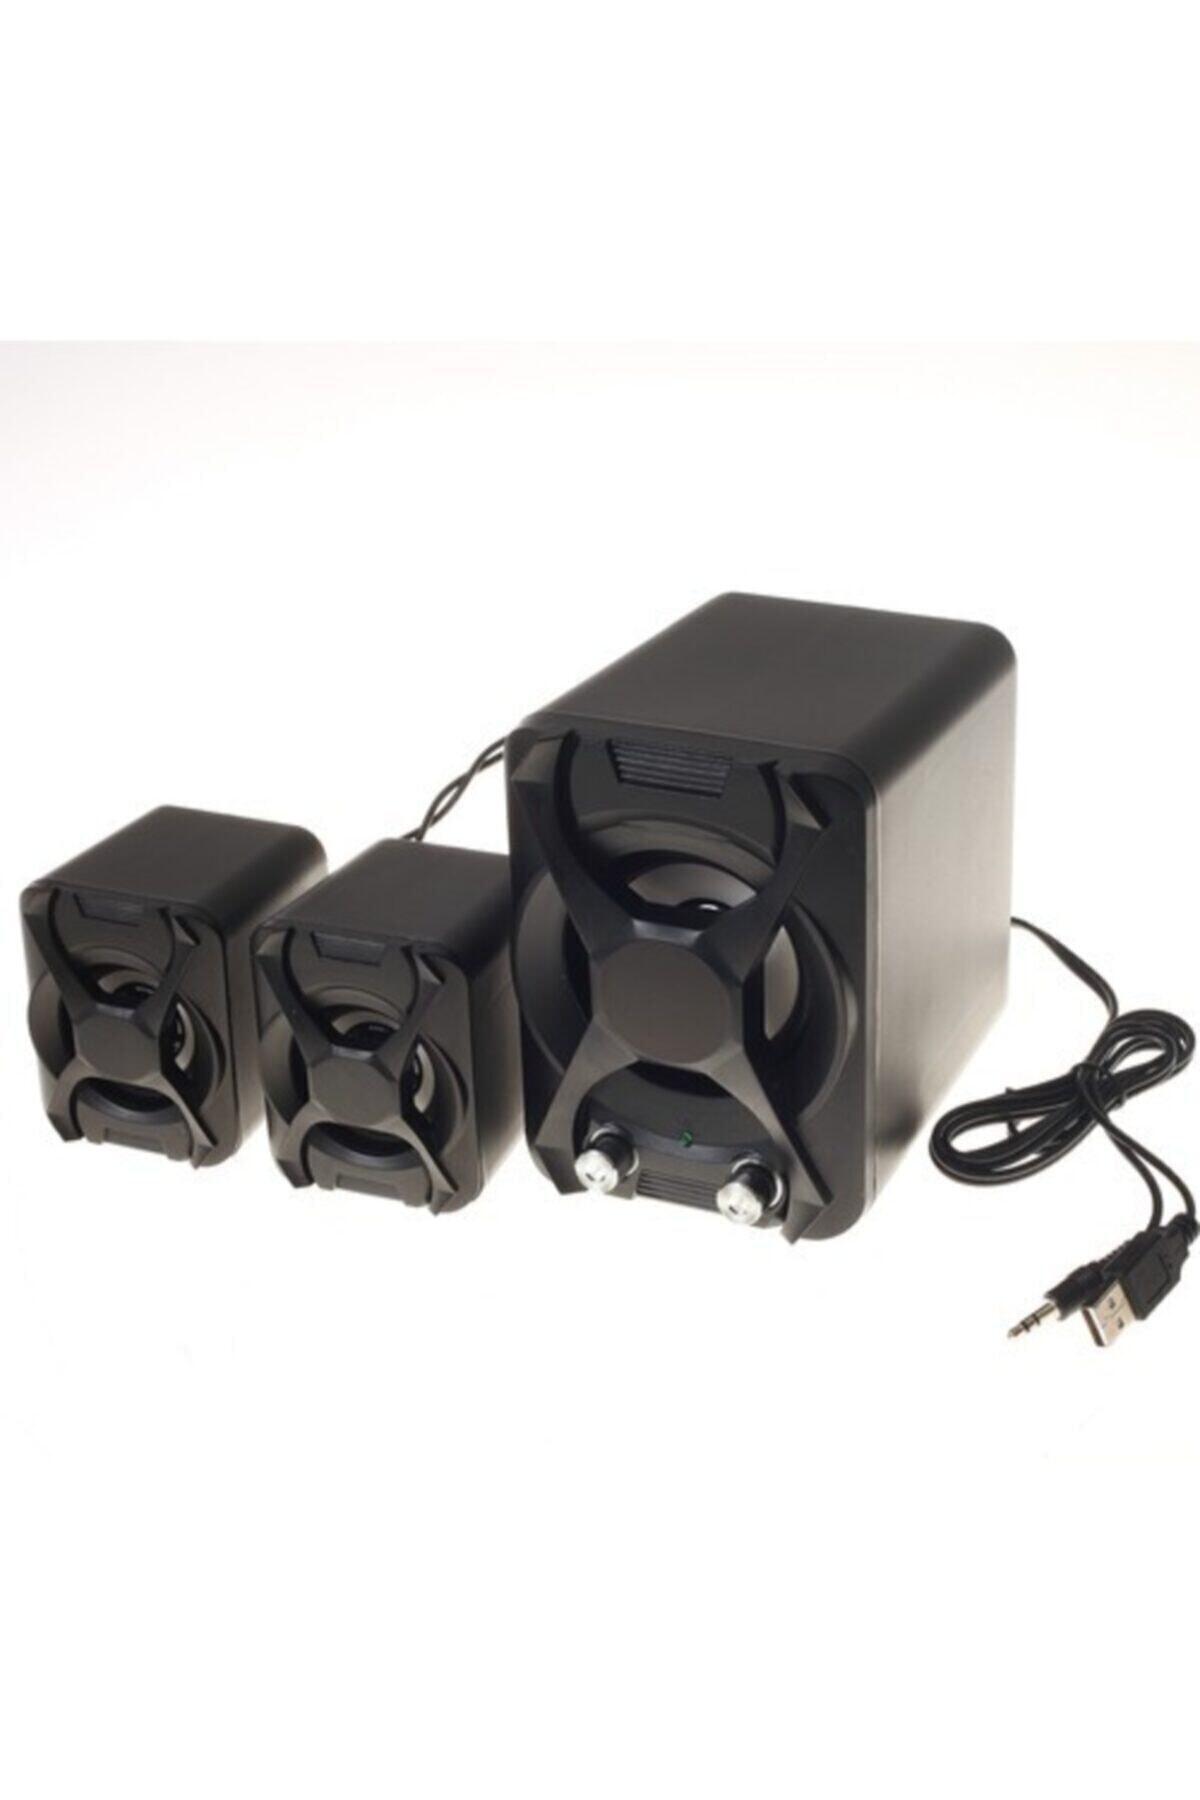 Pl-4243 Mini 2+1 Usb Multimedia Speaker